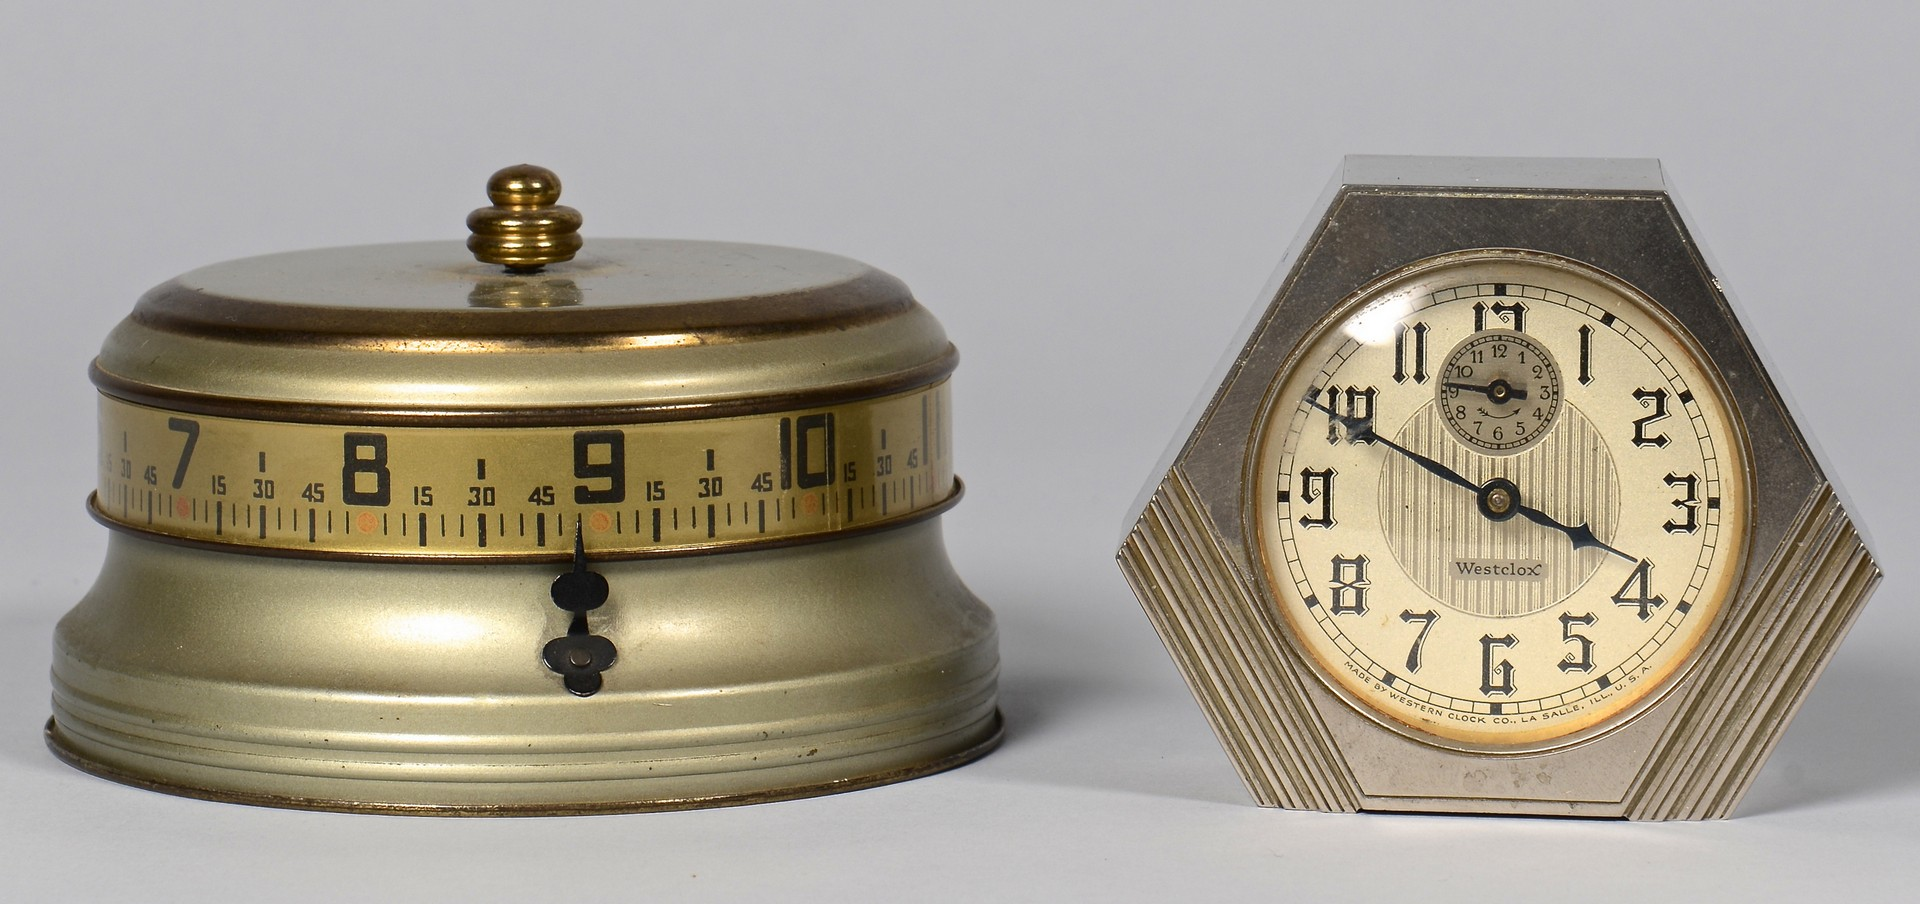 Lot 857: Grouping of 4 Vintage American Clocks